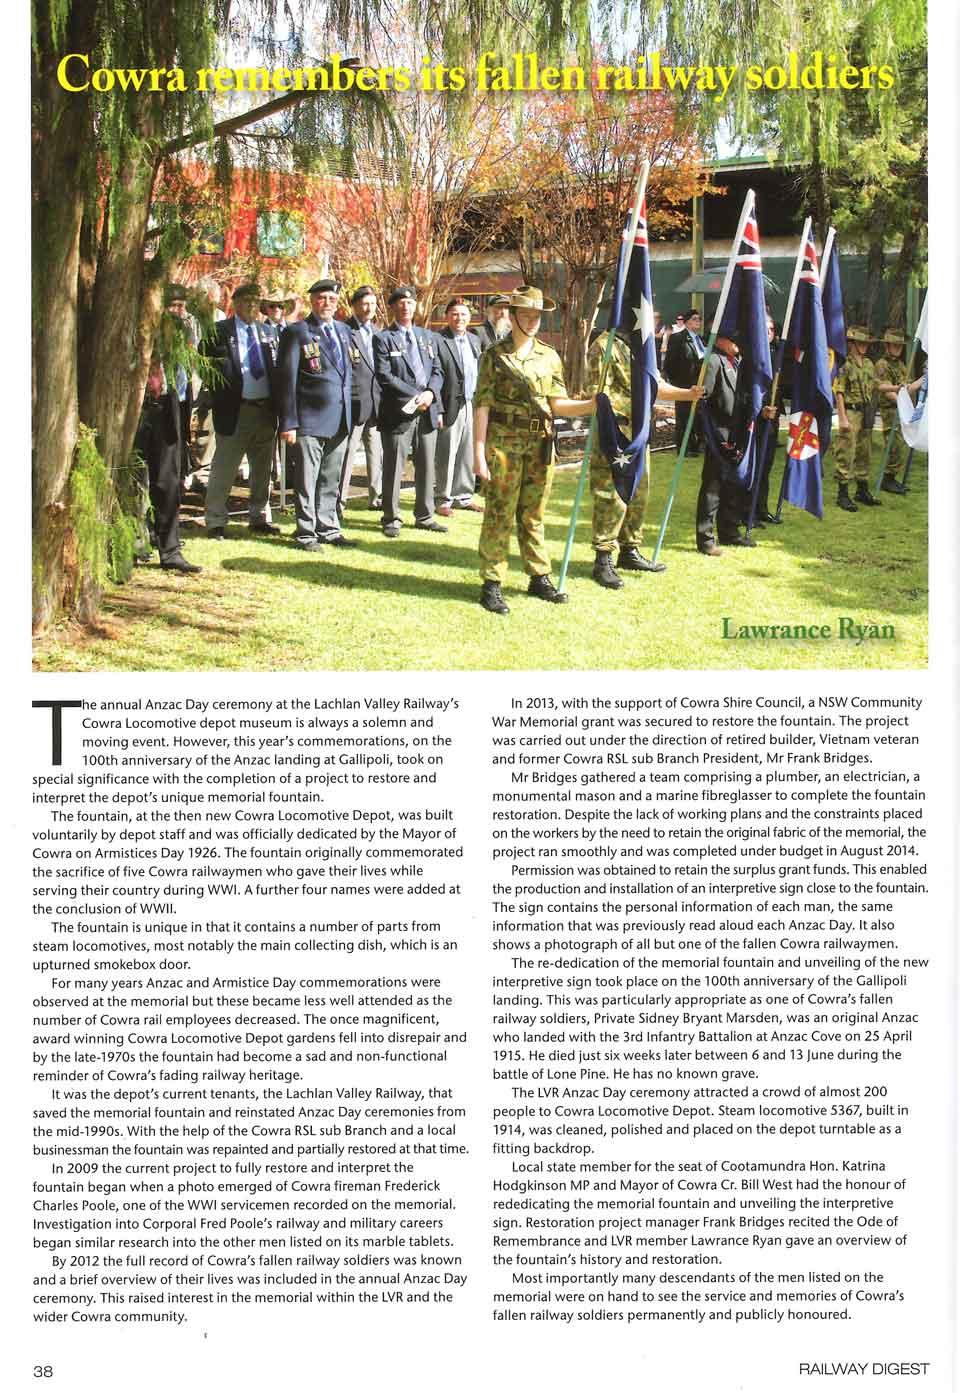 Cowra's Railway Soldiers - Railway Digest p1